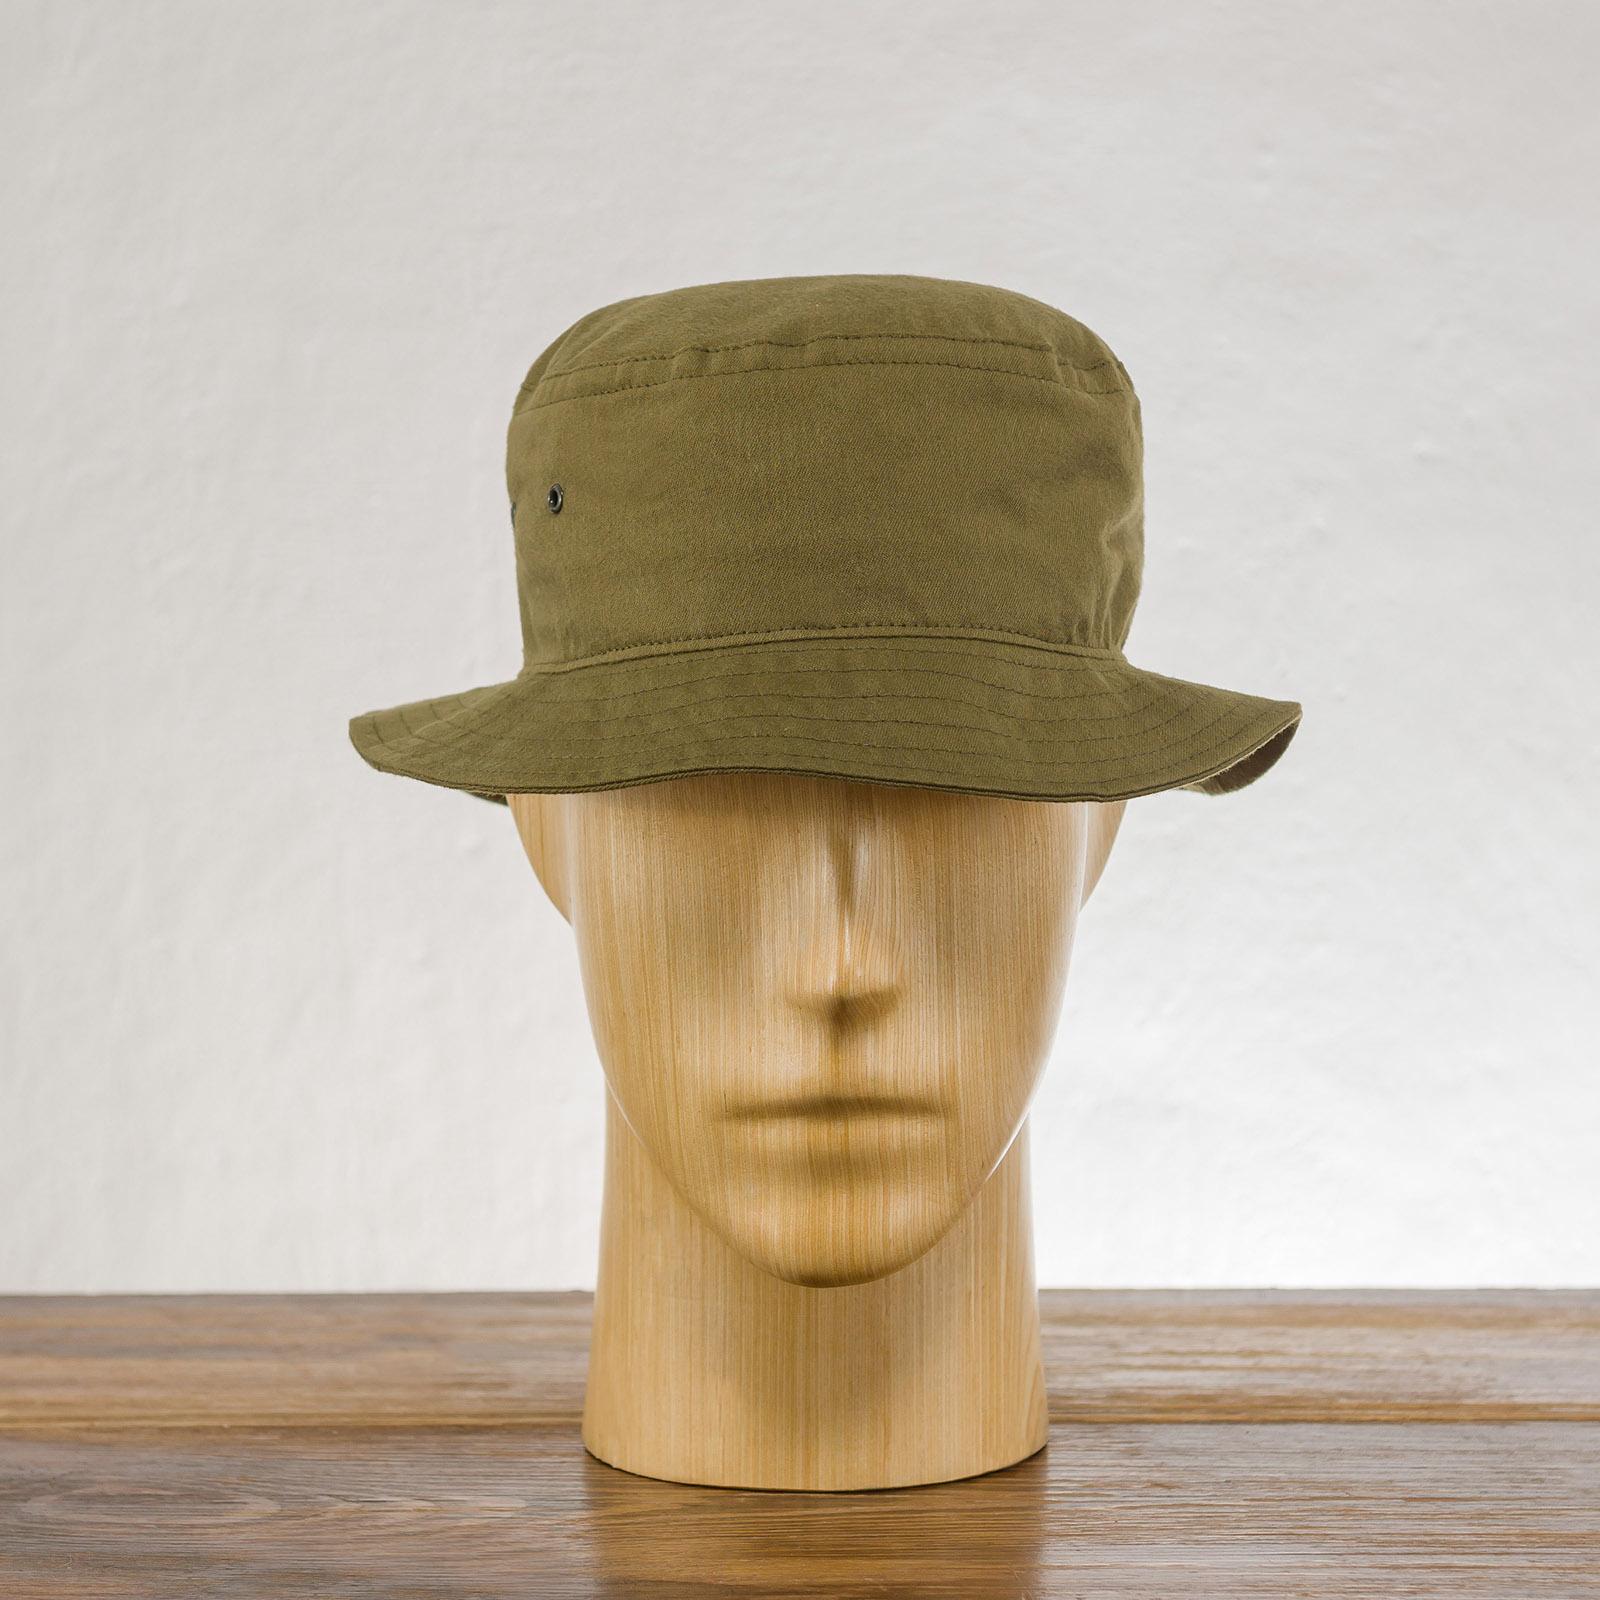 Bawełniany kapelusz typu Bucket trekkingowy rybacki na lato